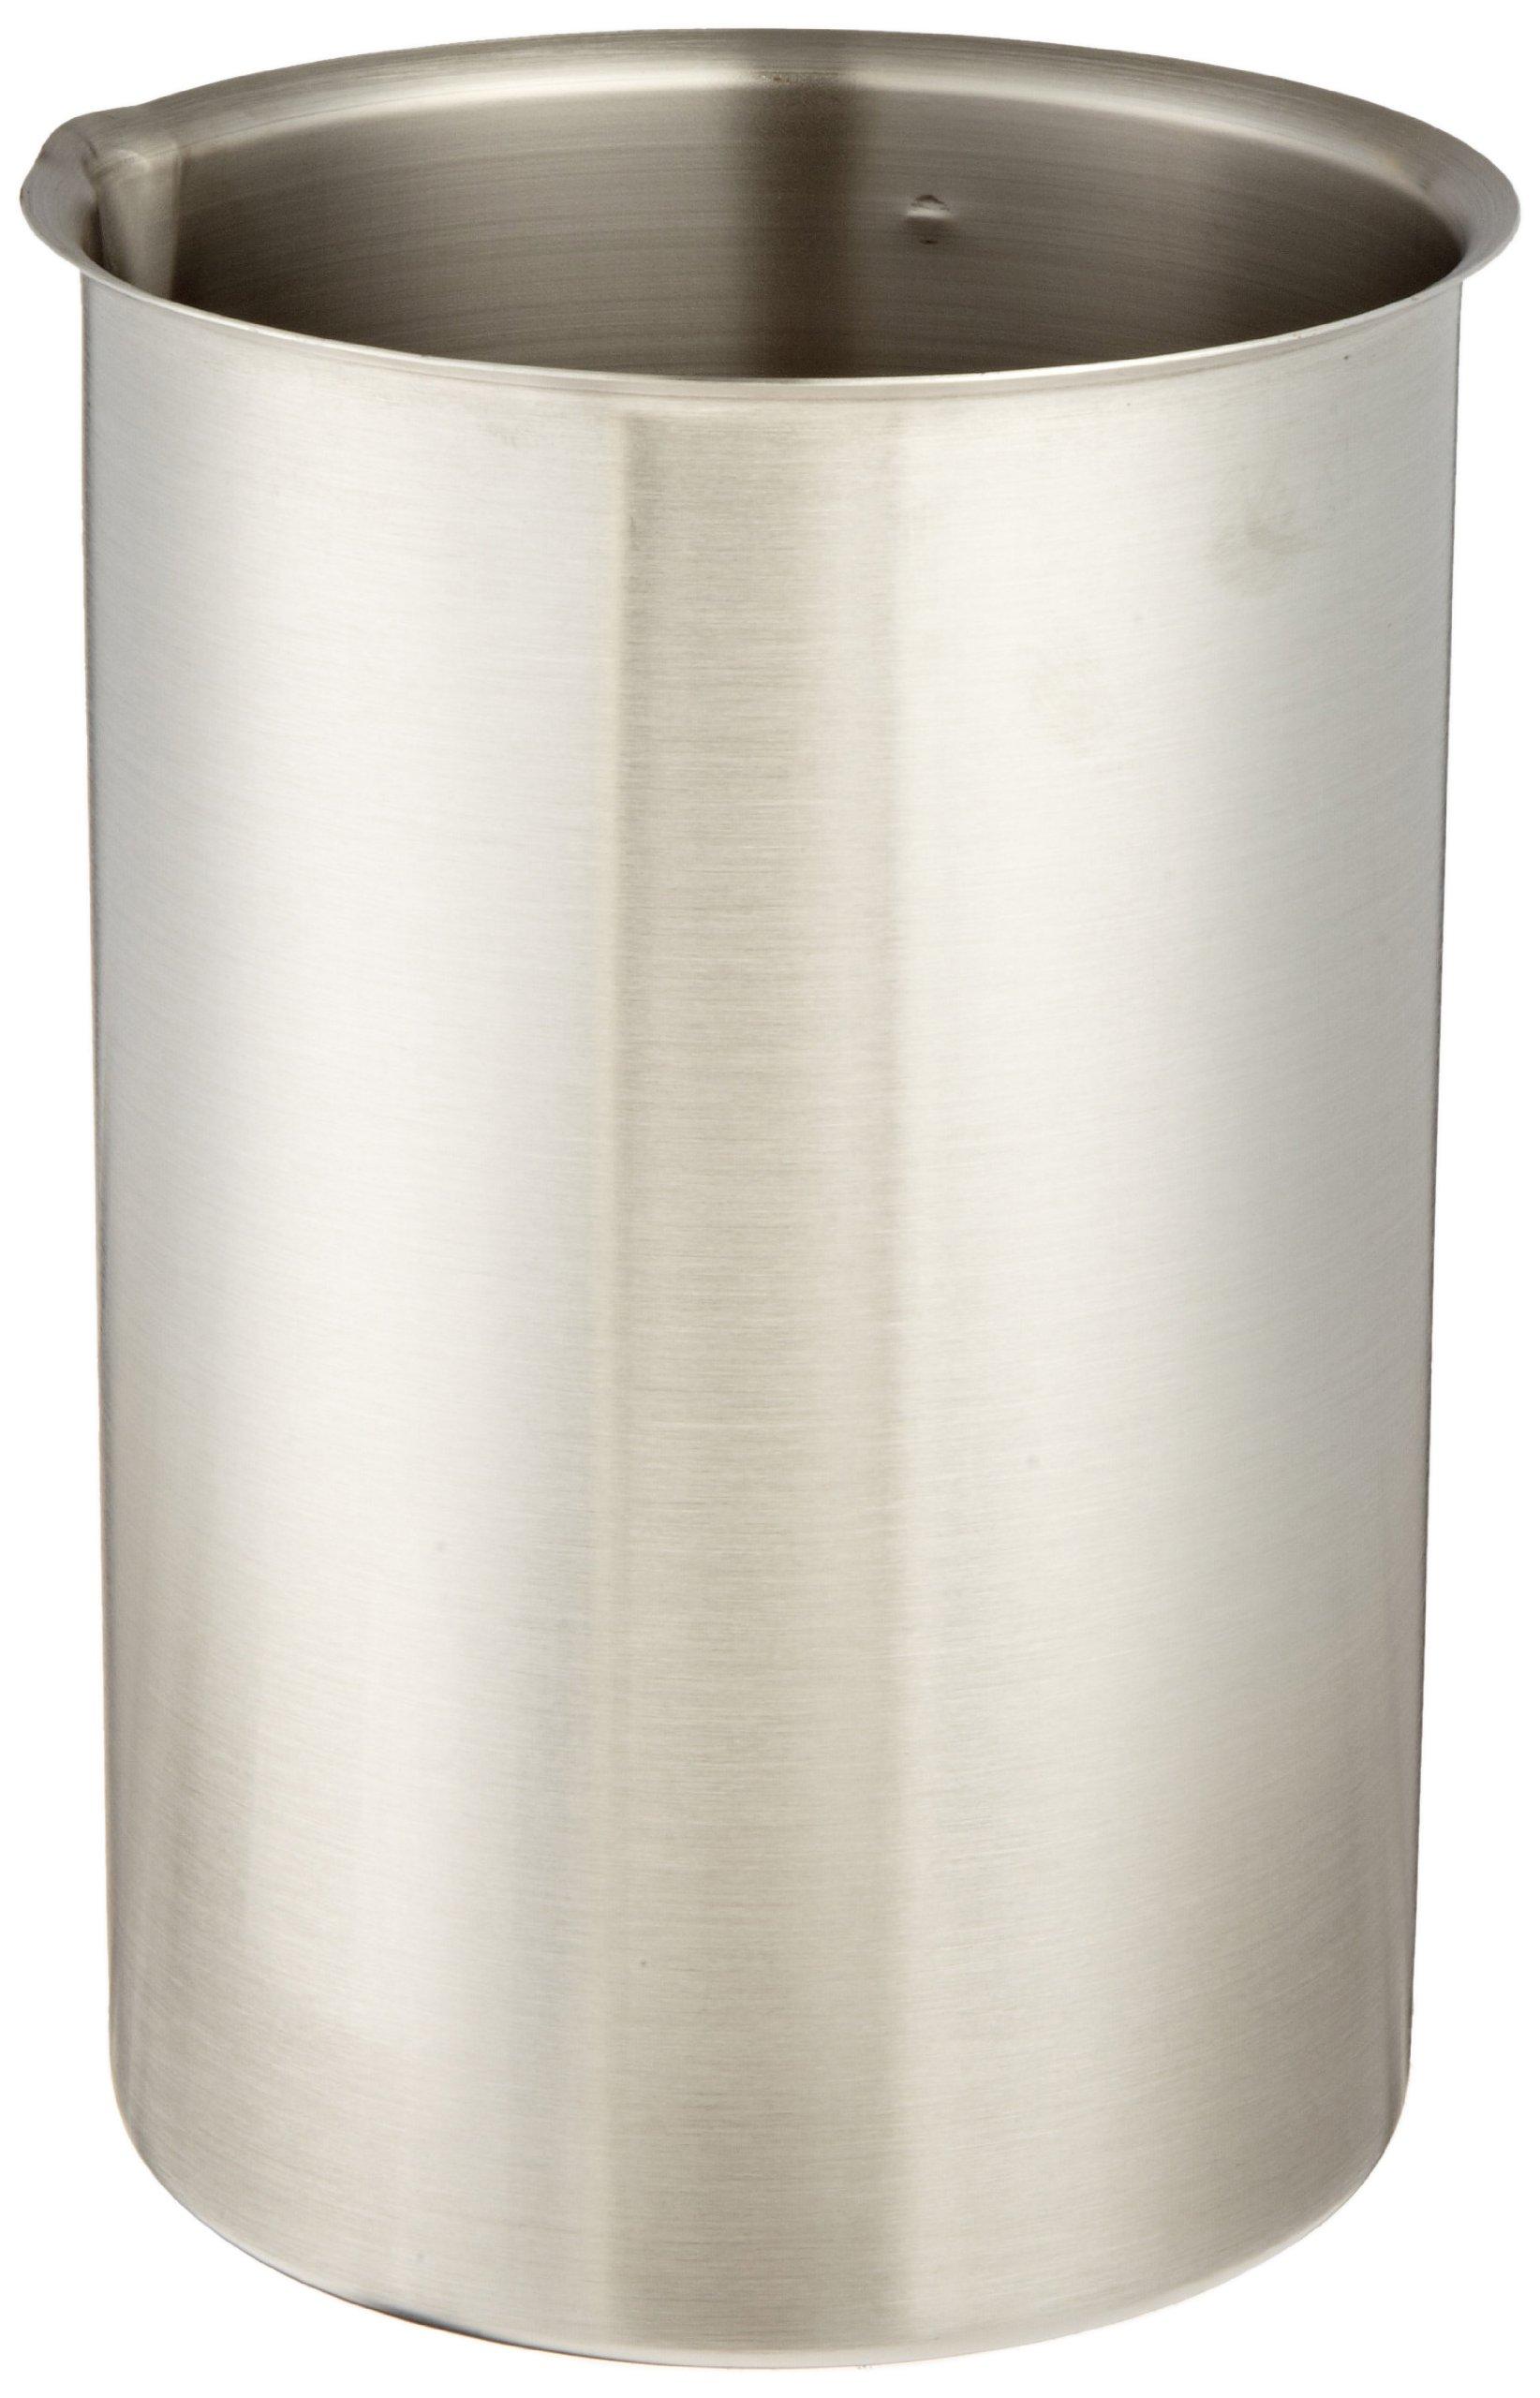 Polar Ware 4000B Stainless Steel Griffin Style Beaker, 4000 mL Capacity, 6-1/8'' OD x 8-7/8'' H